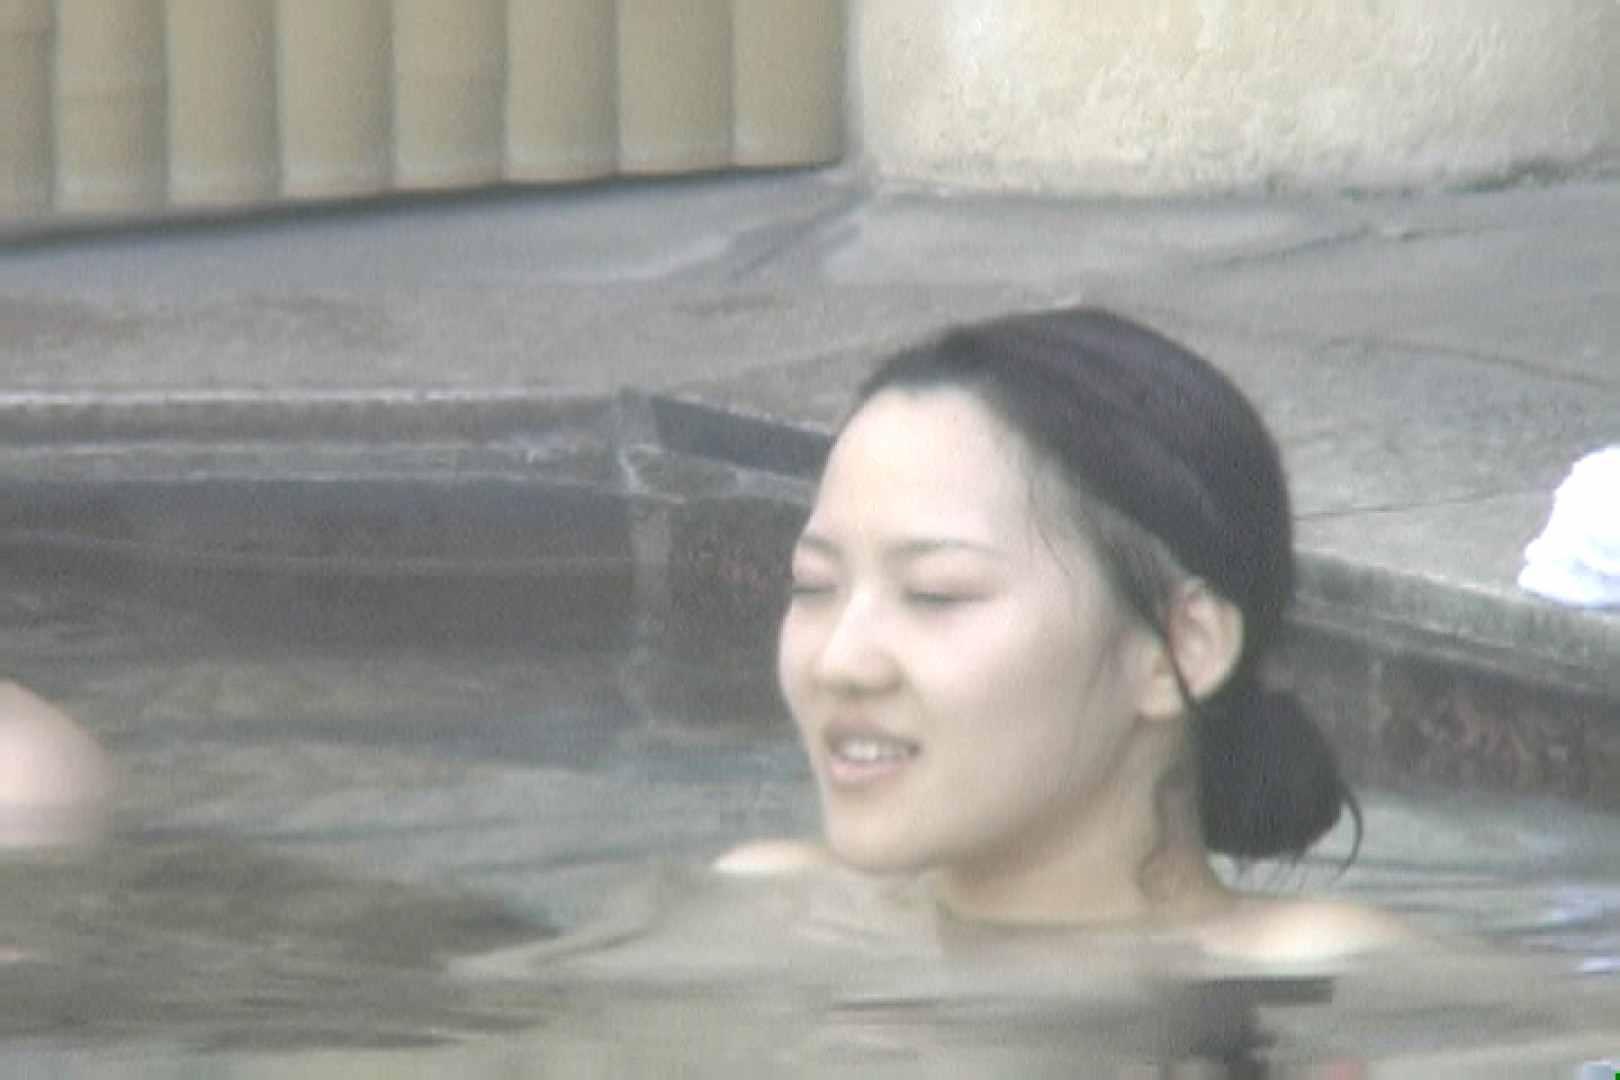 Aquaな露天風呂Vol.689 露天風呂 セックス無修正動画無料 50連発 29